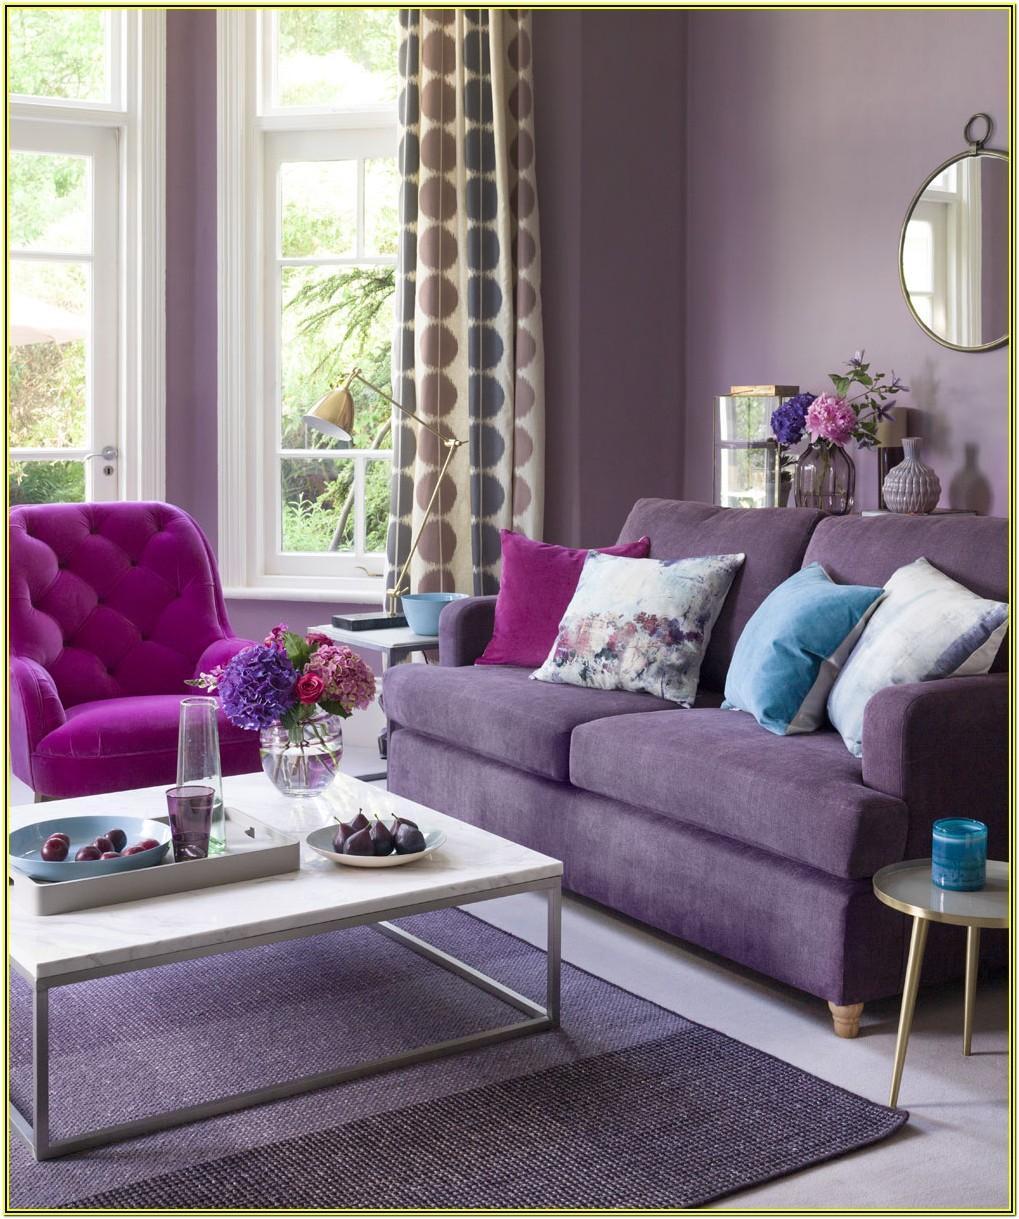 Living Room Ideas With Light Purple Walls